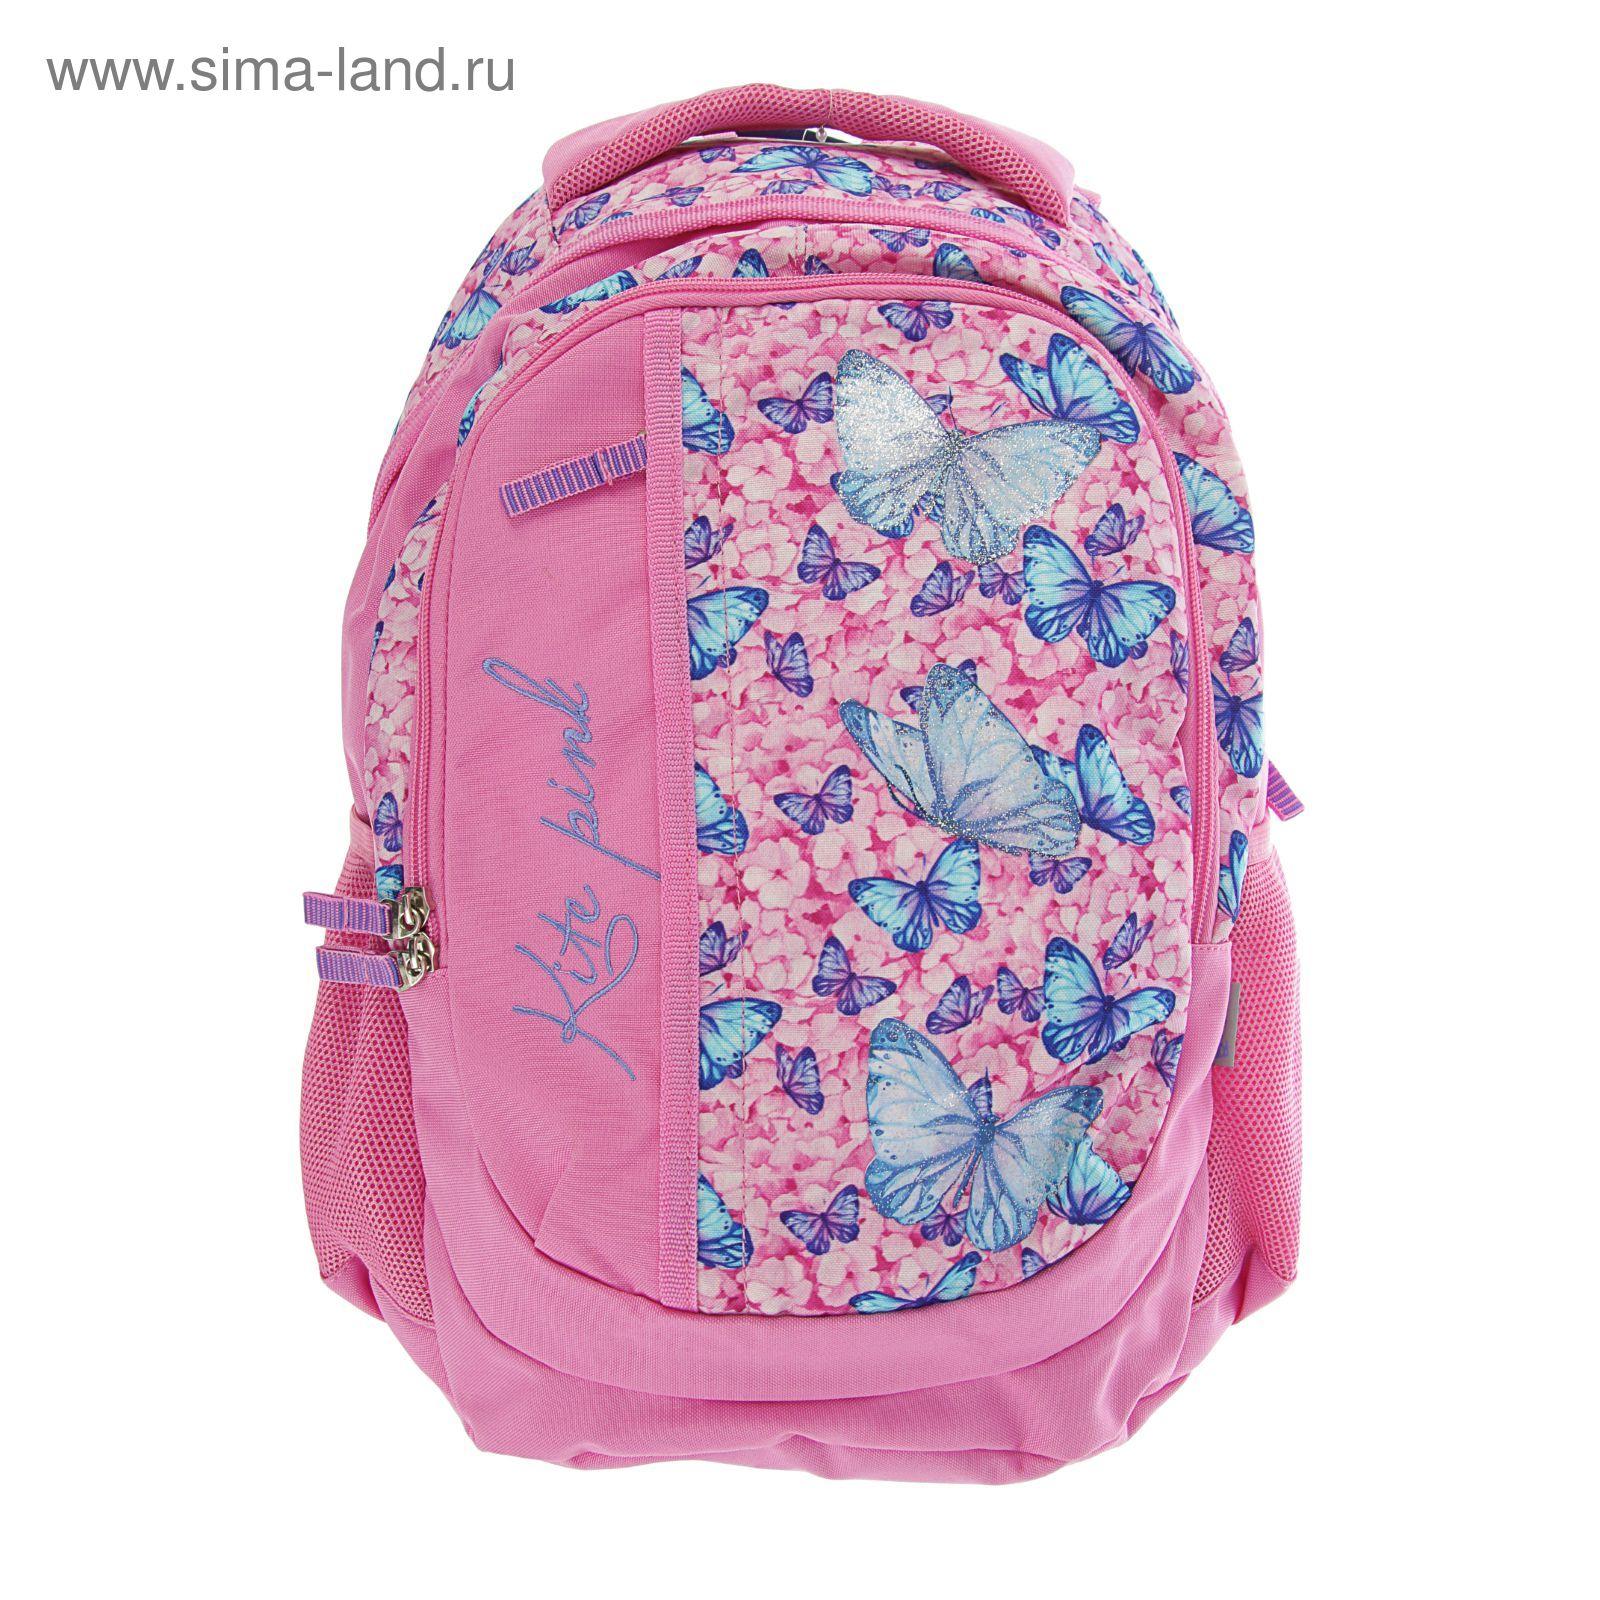 3321d39b0740 Рюкзак школьный эргономичная спинка Kite 855 Junior-2, 40 х 30 х 18 ...